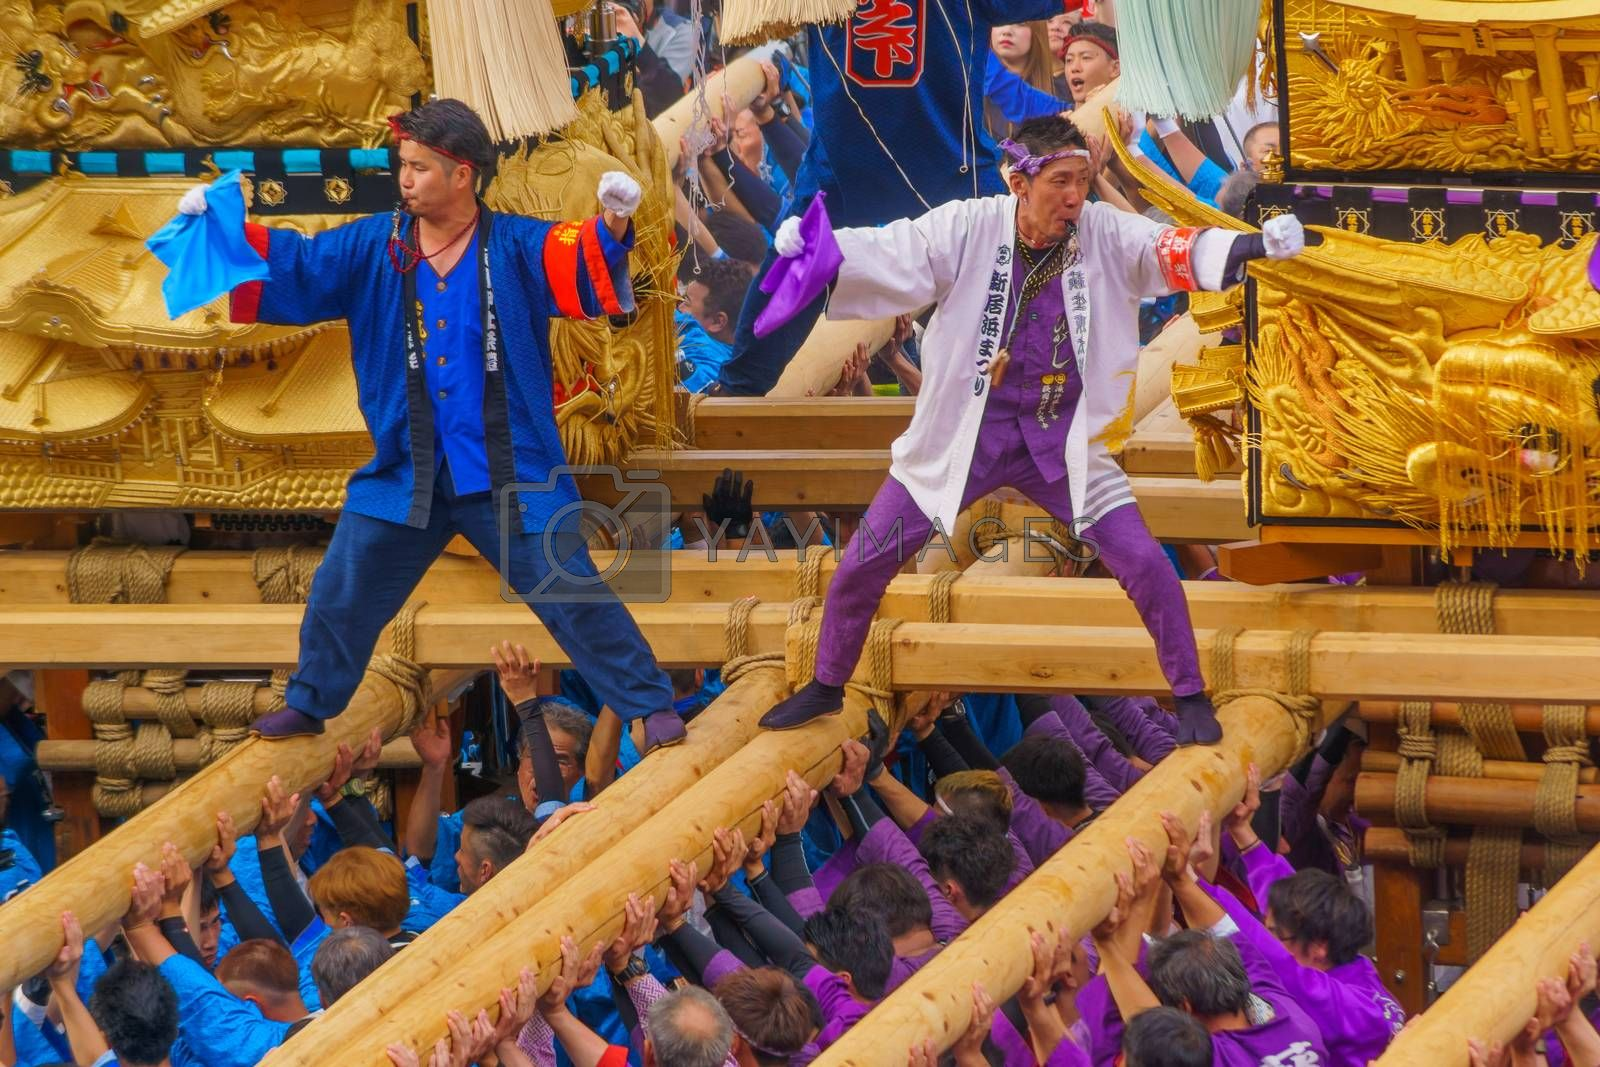 Niihama, Japan - October 17, 2019: Men in traditional clothing lifting a taikodai drum float, as part of the Niihama Taiko Festival, Ehime, Shikoku Island, Japan